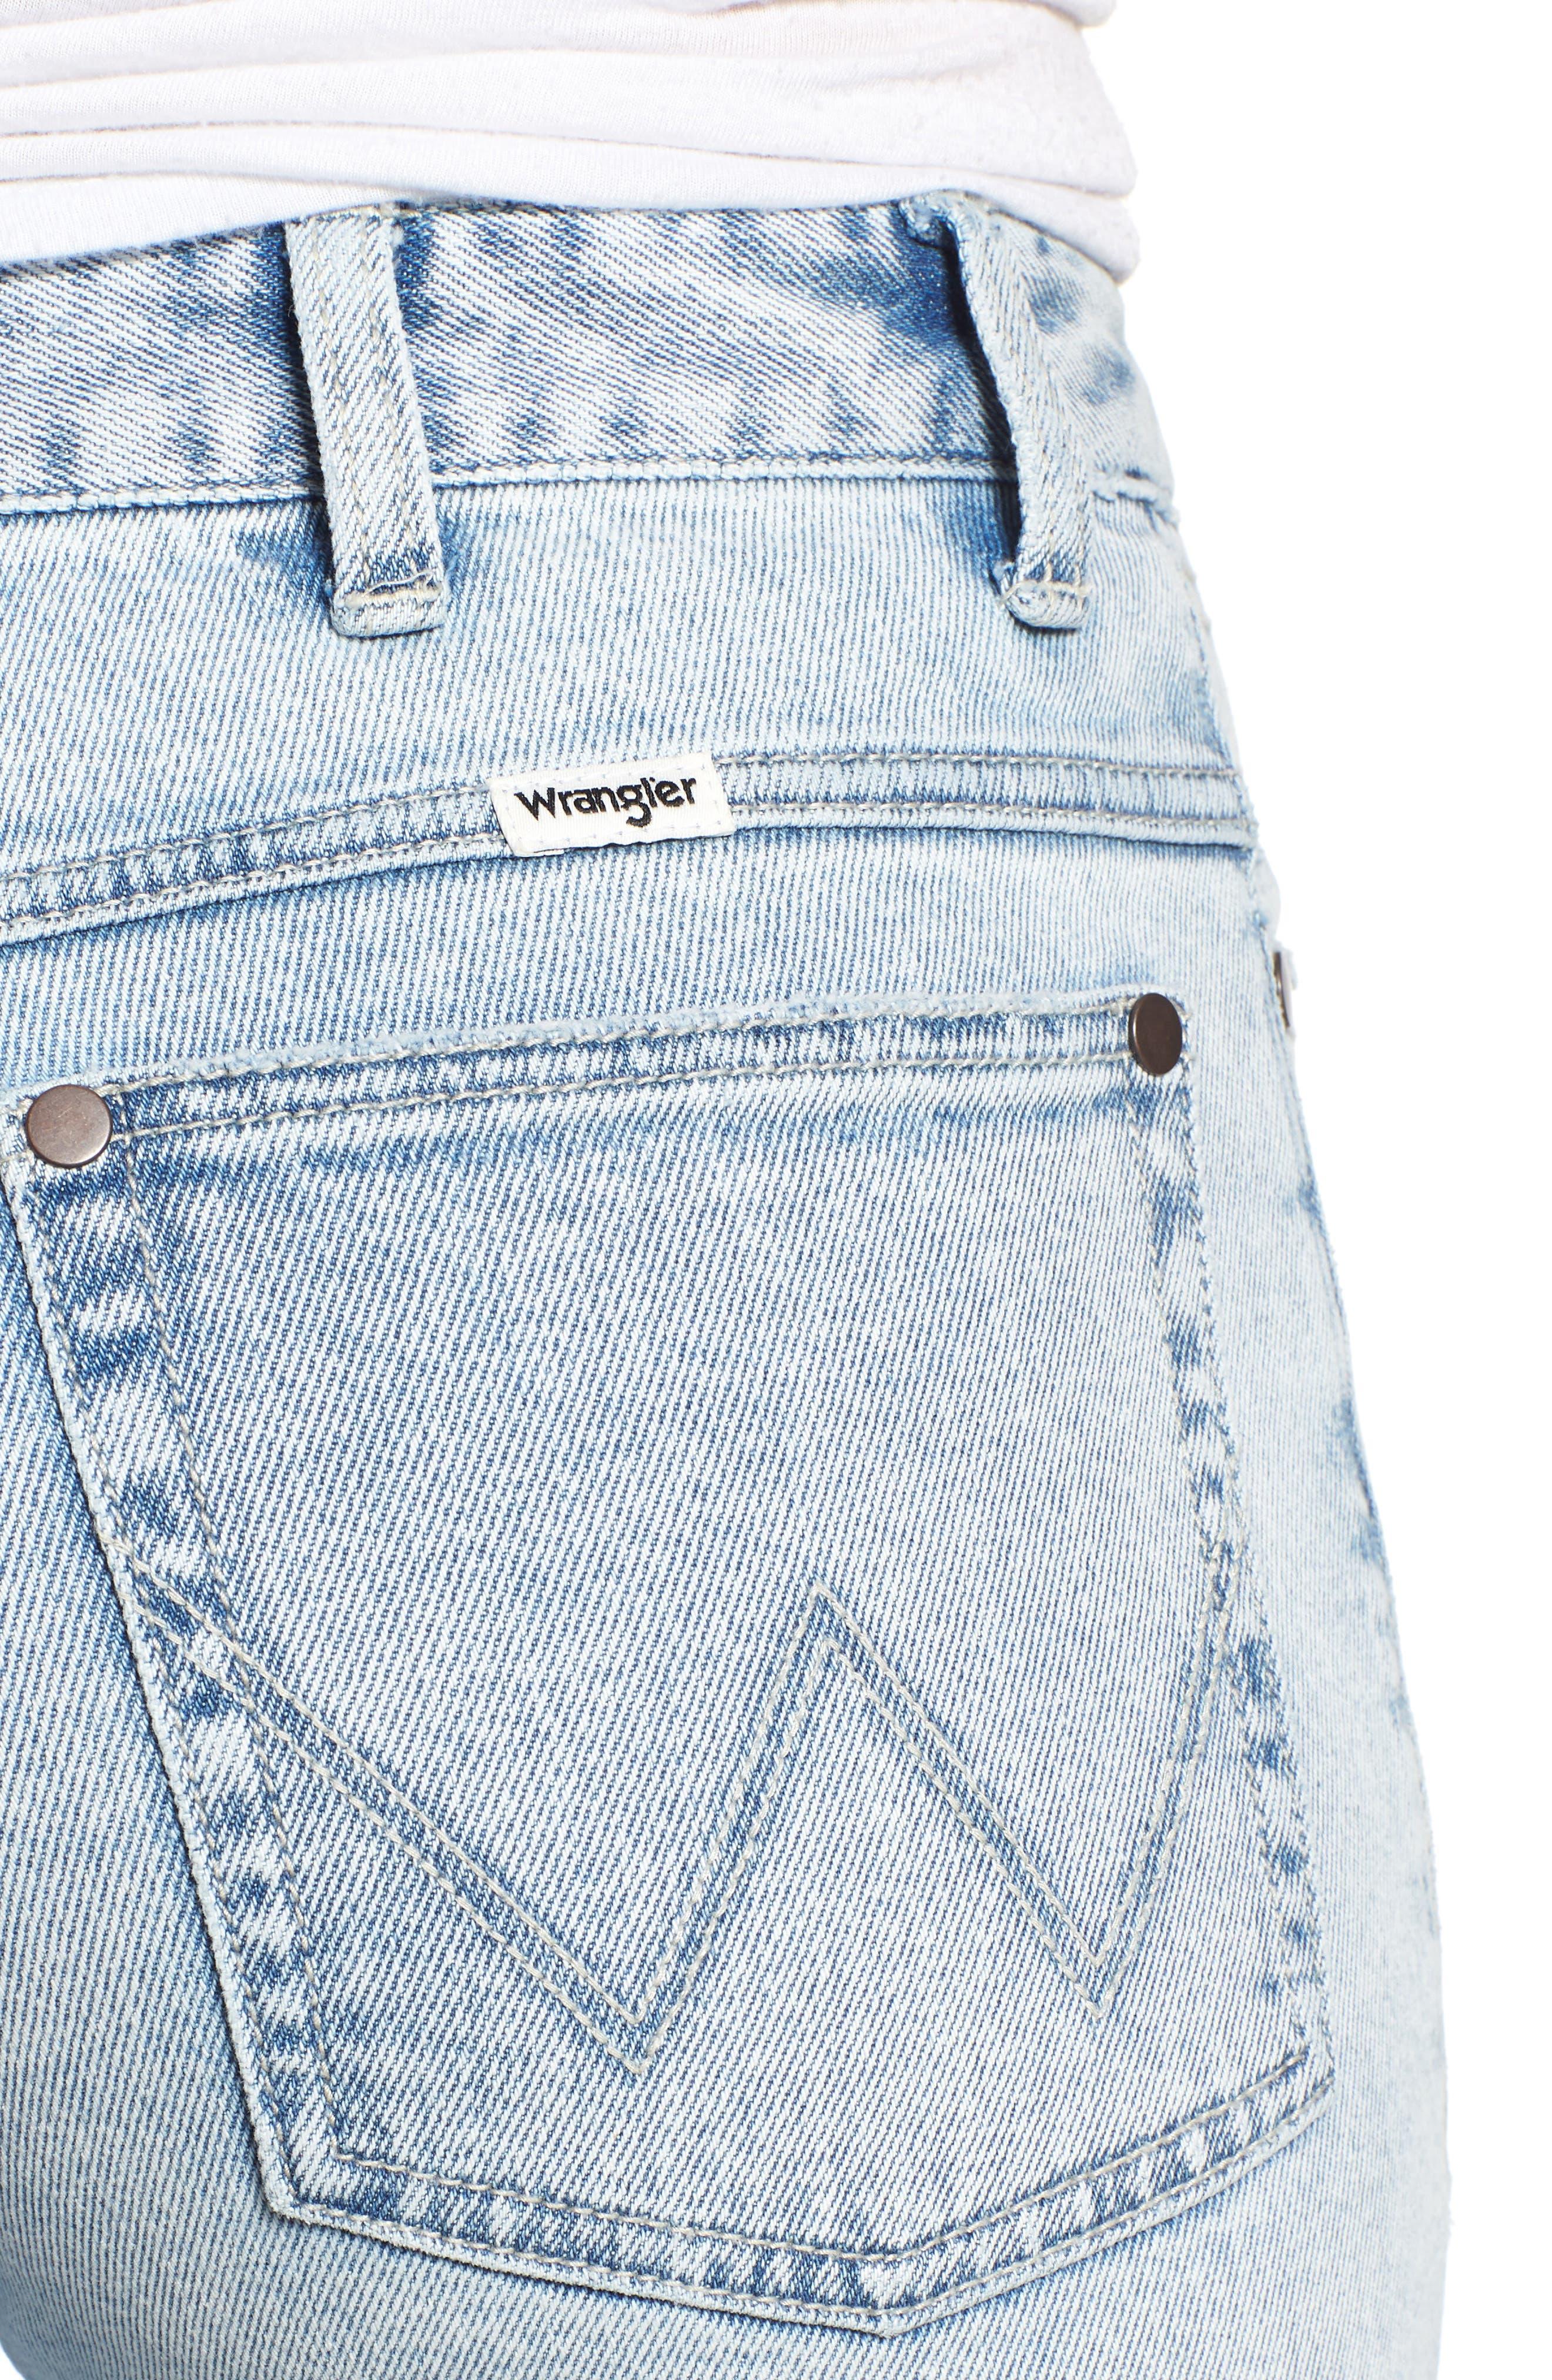 Acid Wash High Waist Crop Jeans,                             Alternate thumbnail 4, color,                             Light Acid